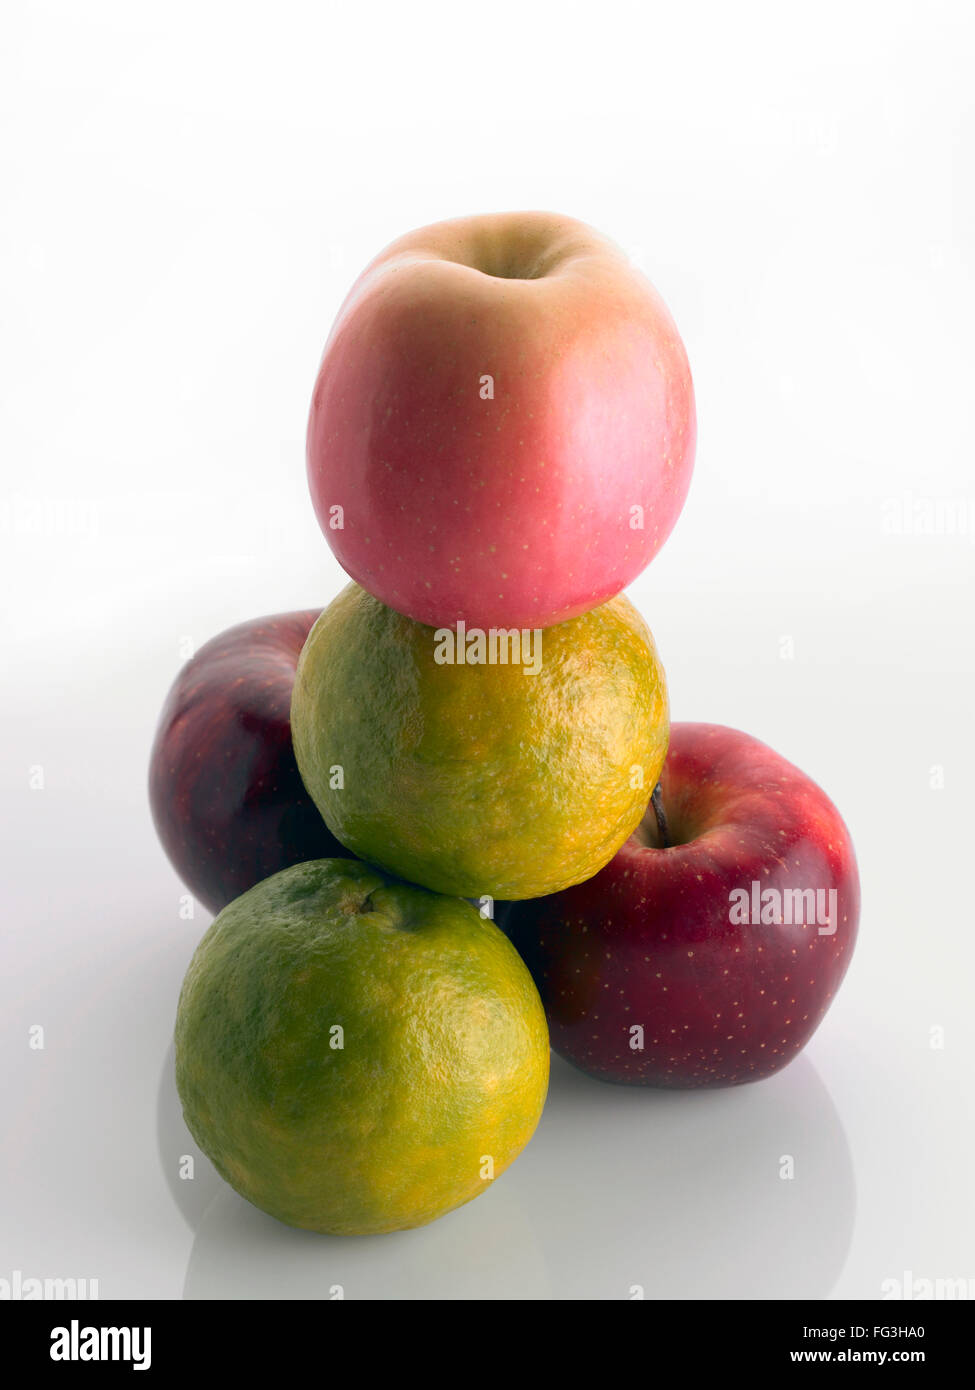 Fruits ; apples and oranges arrange on white background - Stock Image